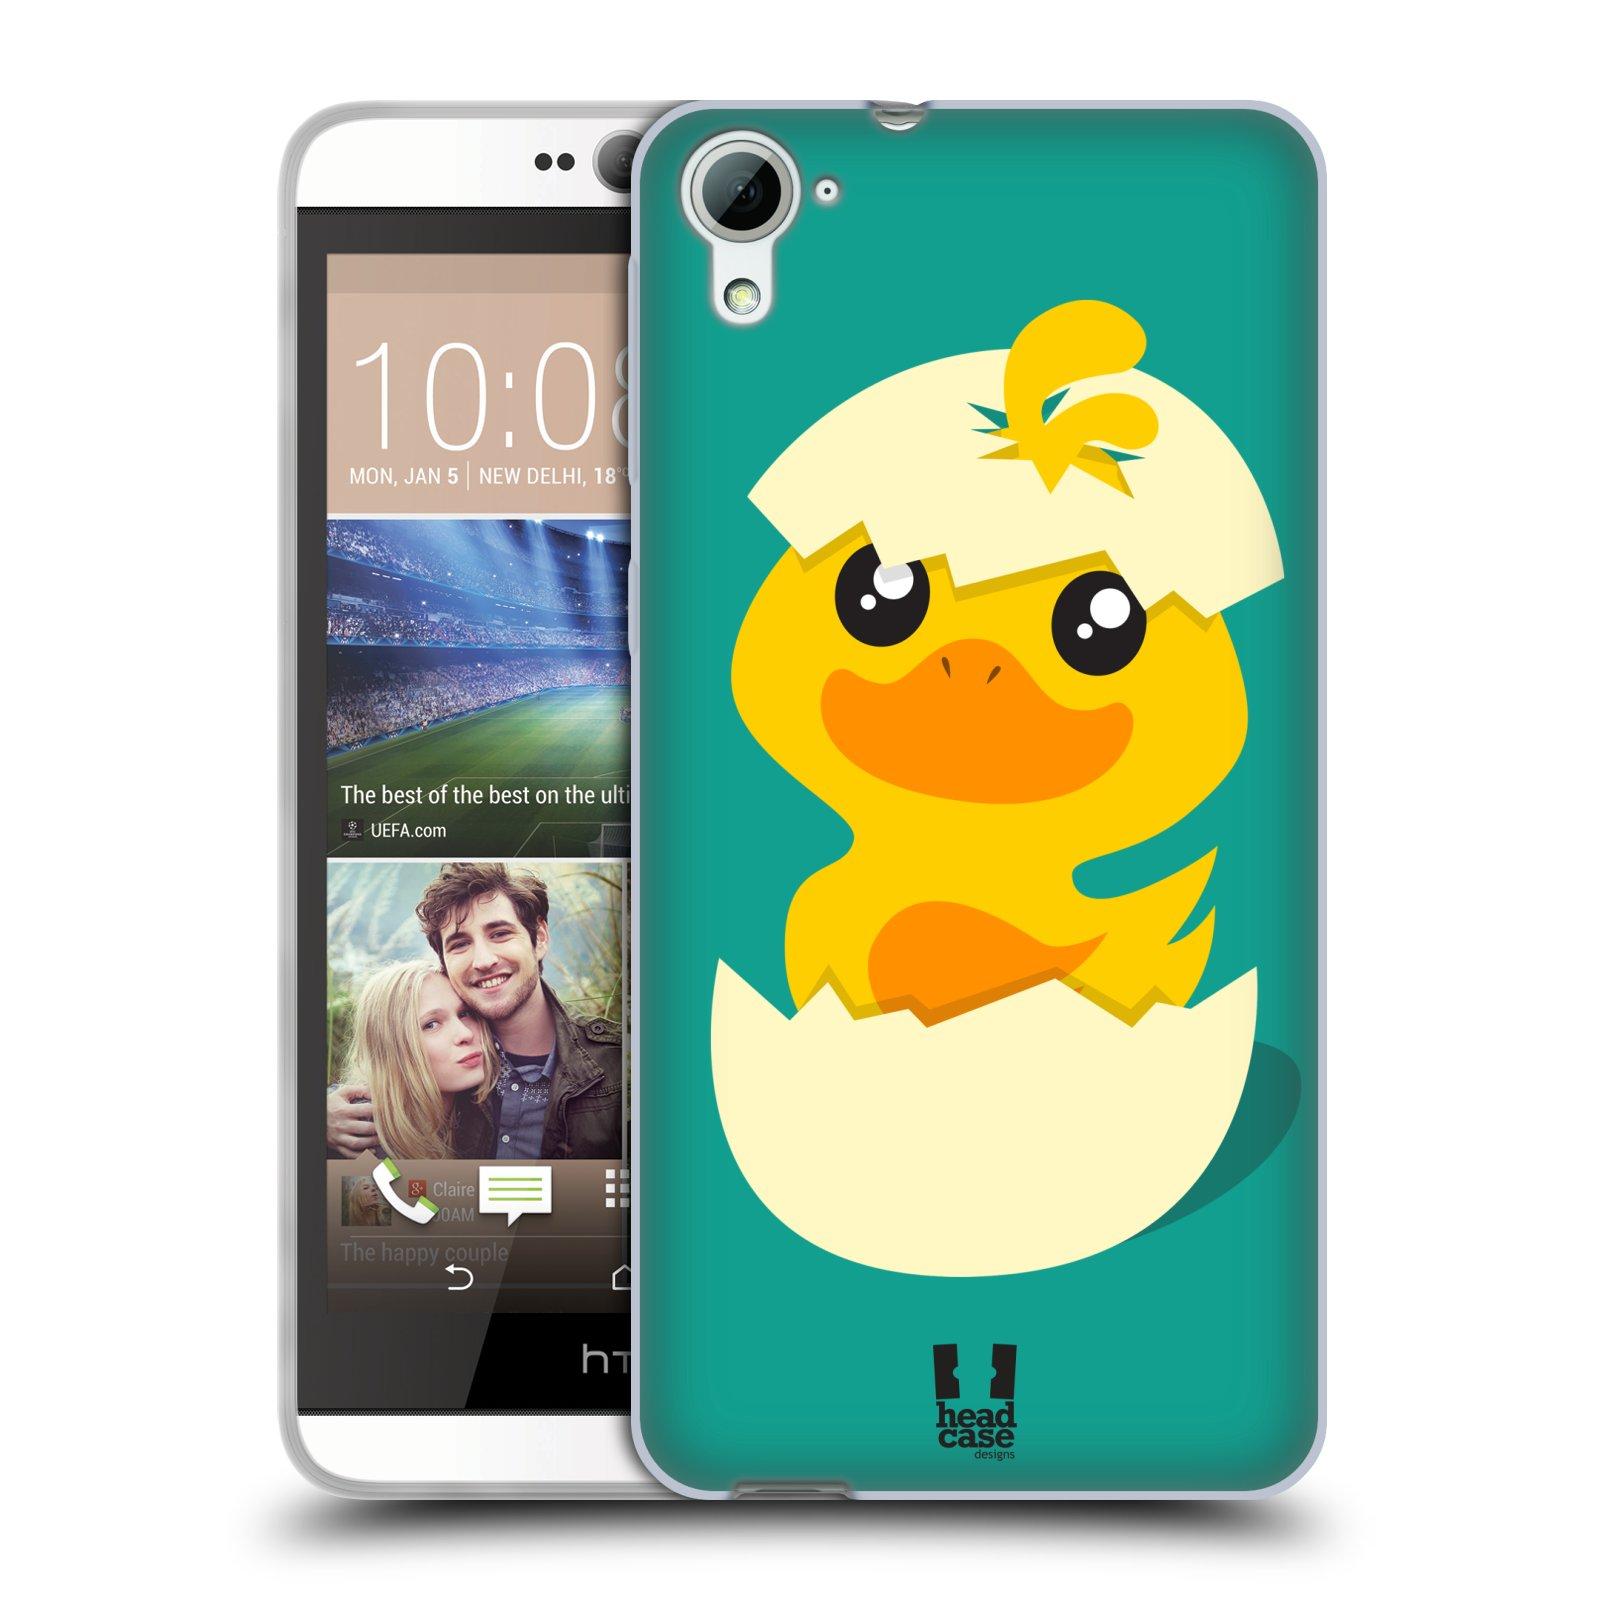 Silikonové pouzdro na mobil HTC Desire 826 HEAD CASE KACHNIČKA Z VAJÍČKA (Silikonový kryt či obal na mobilní telefon HTC Desire 826 Dual SIM)